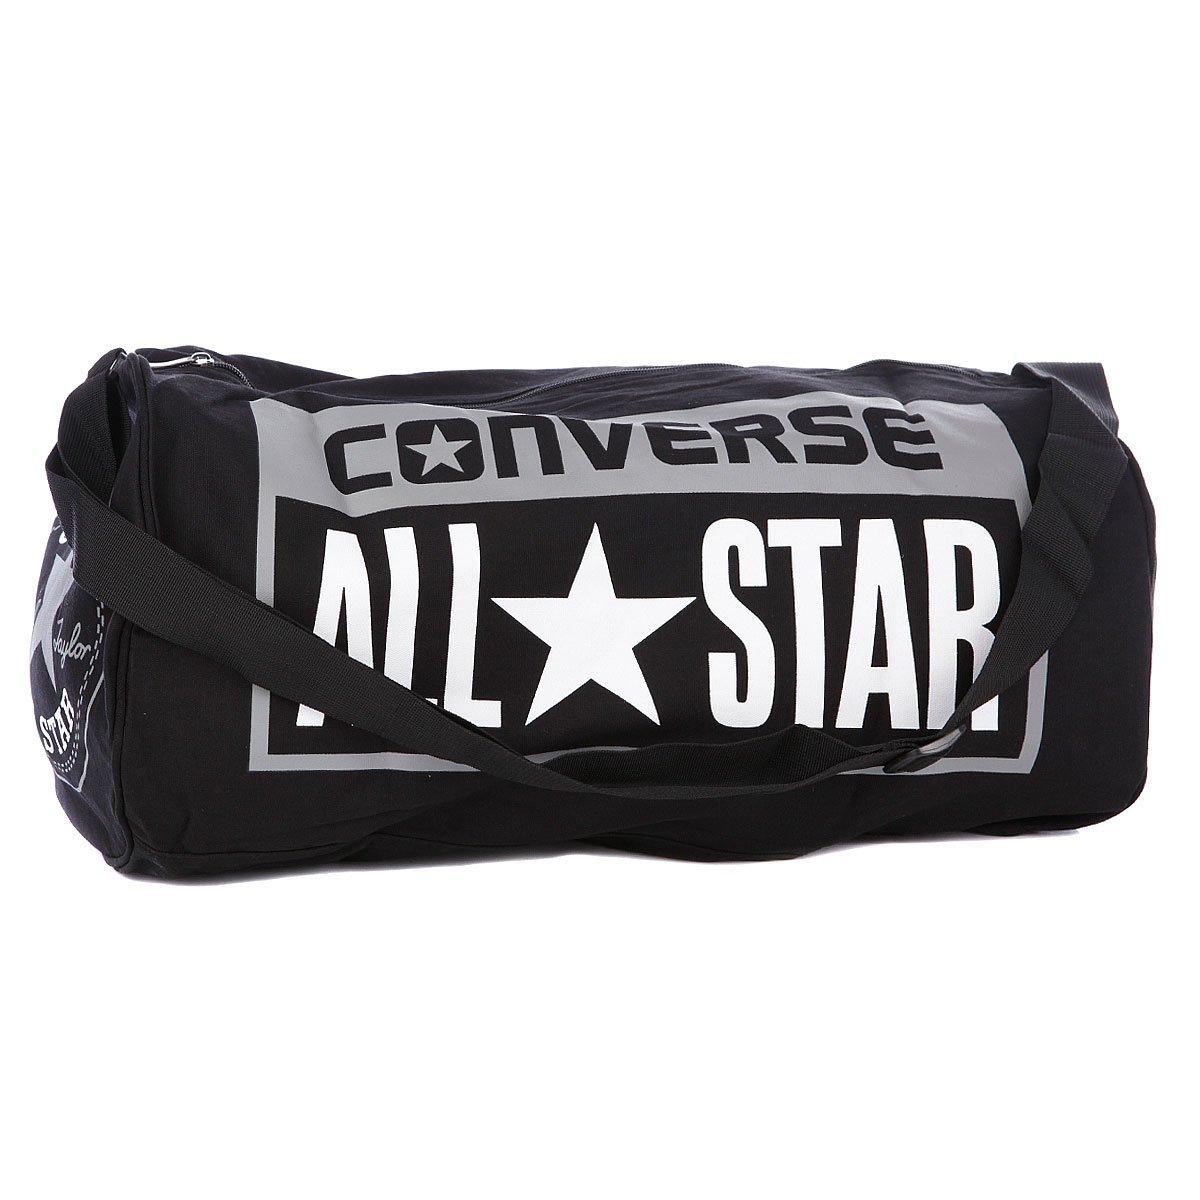 f7e3762b2e2f Купить сумку Converse Legacy Duffel Black в интернет-магазине ...